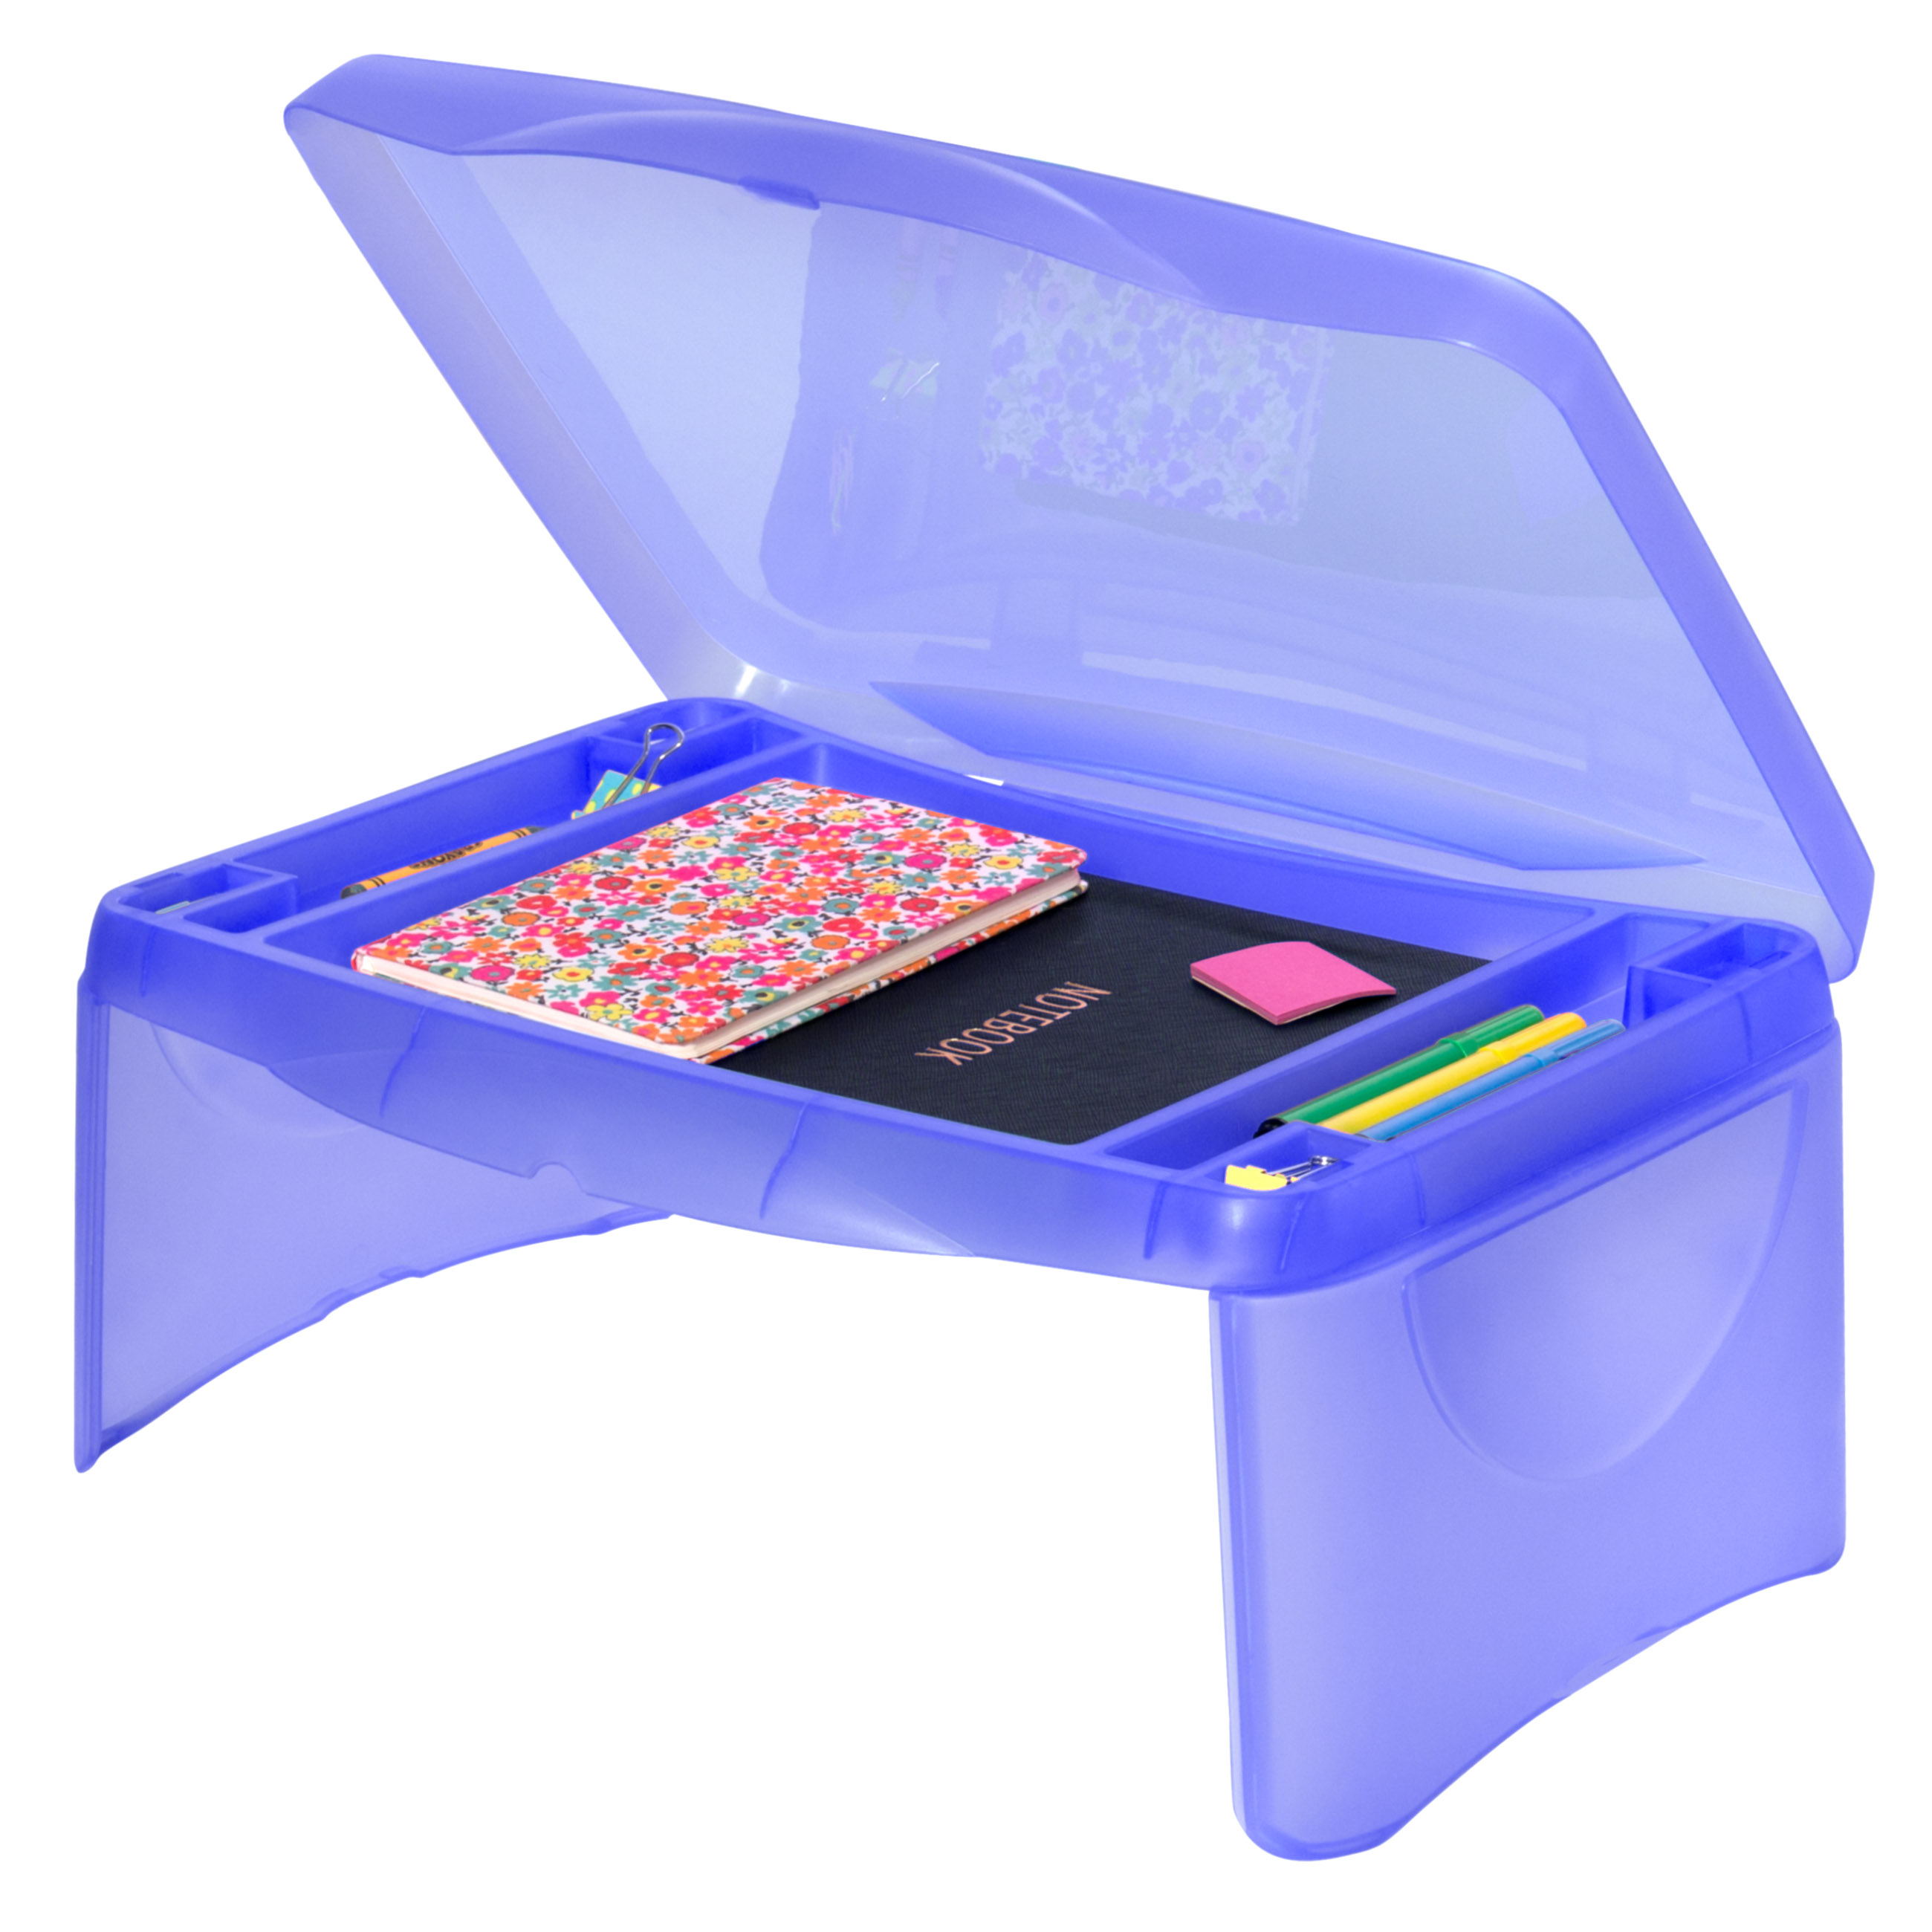 Best Choice Products Kids Folding Lap Desk W  Storage- Blue by Best Choice Products